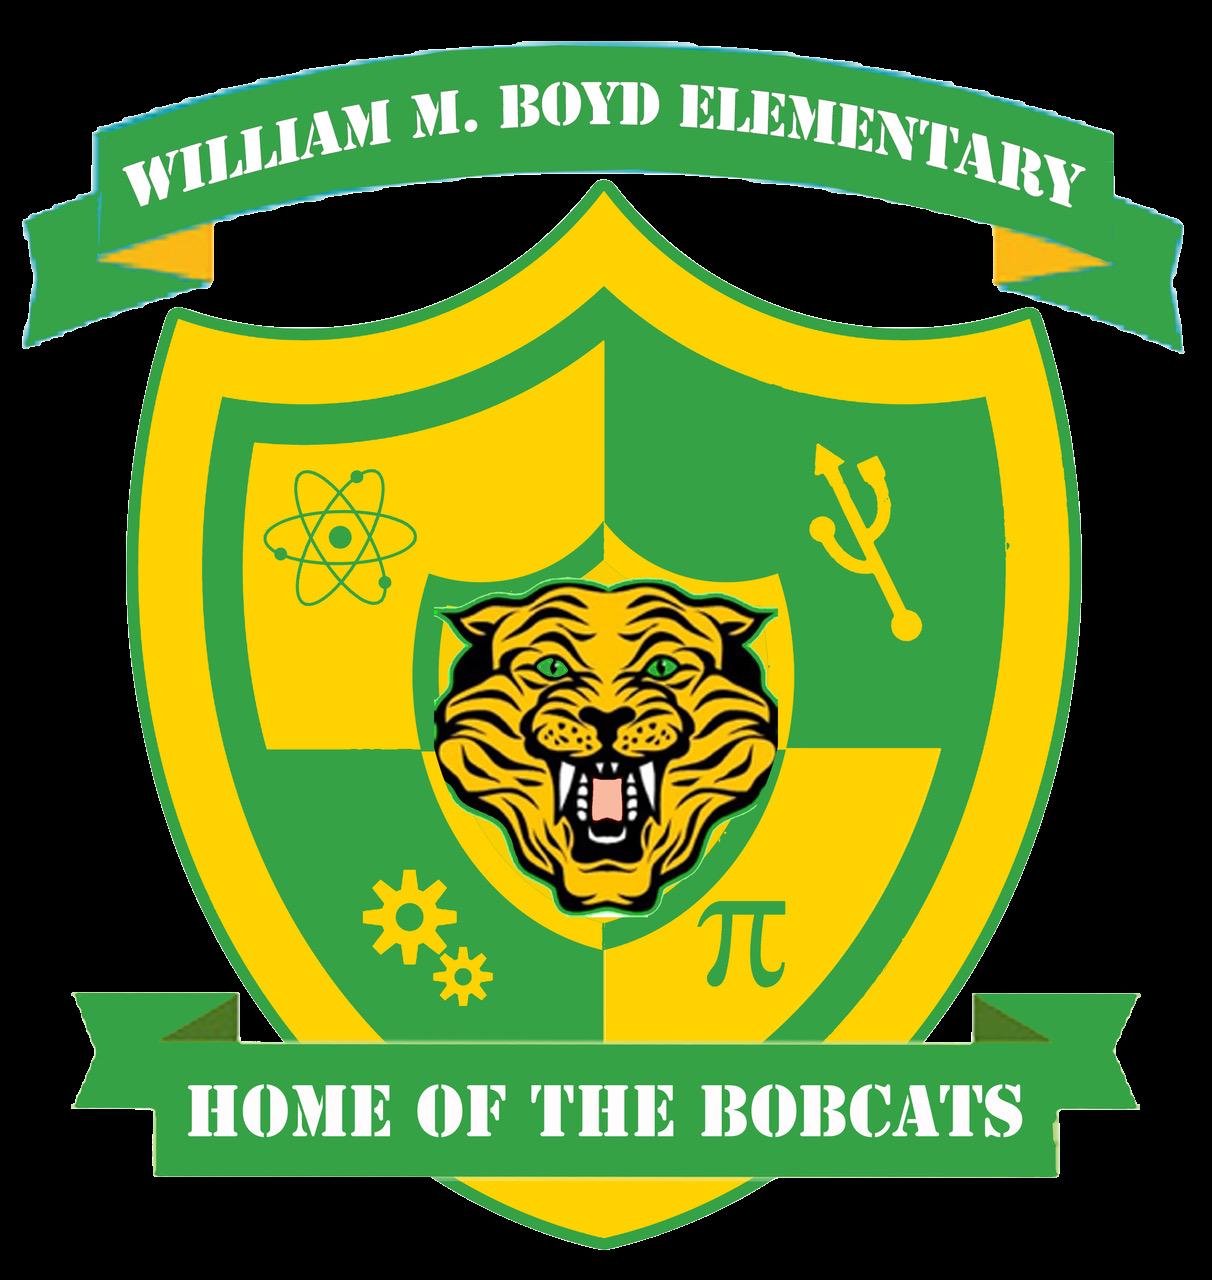 Boyd Elementary School / Overview